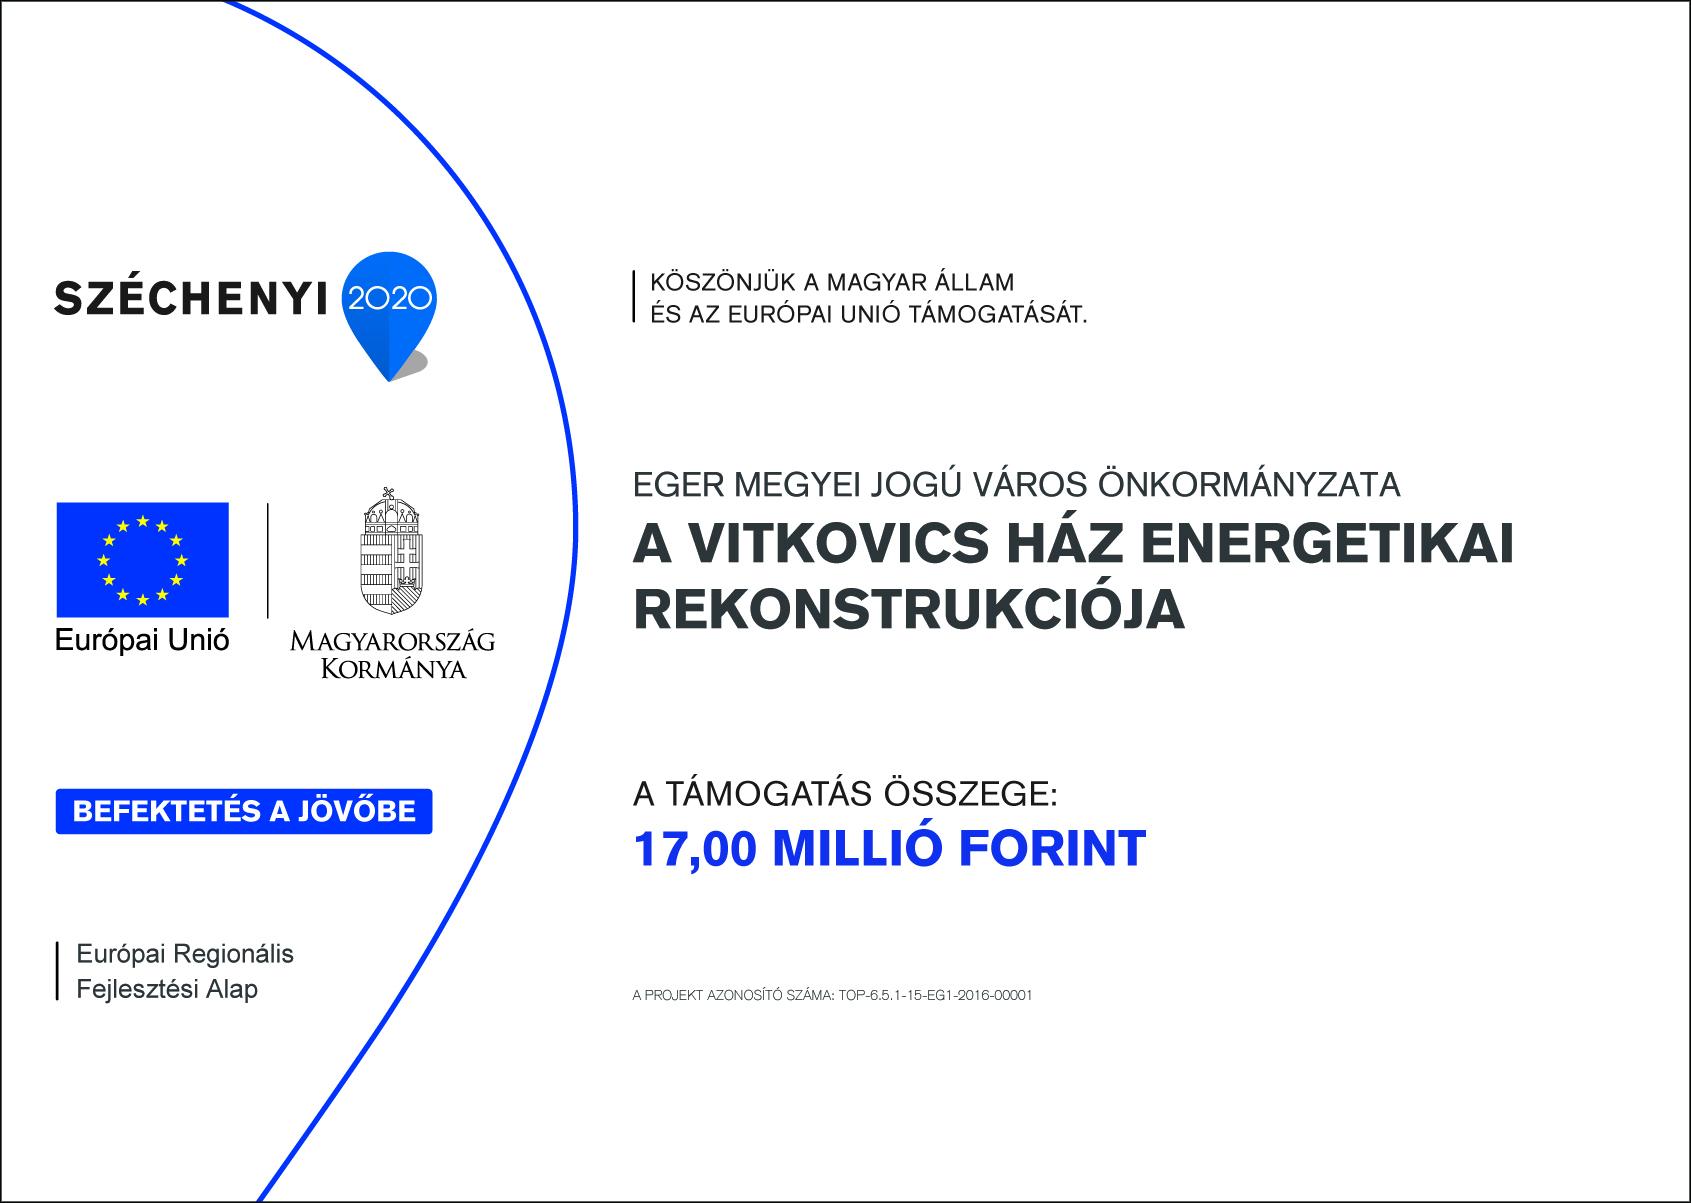 A Vitkovics ház energetikai rekonstrukciója